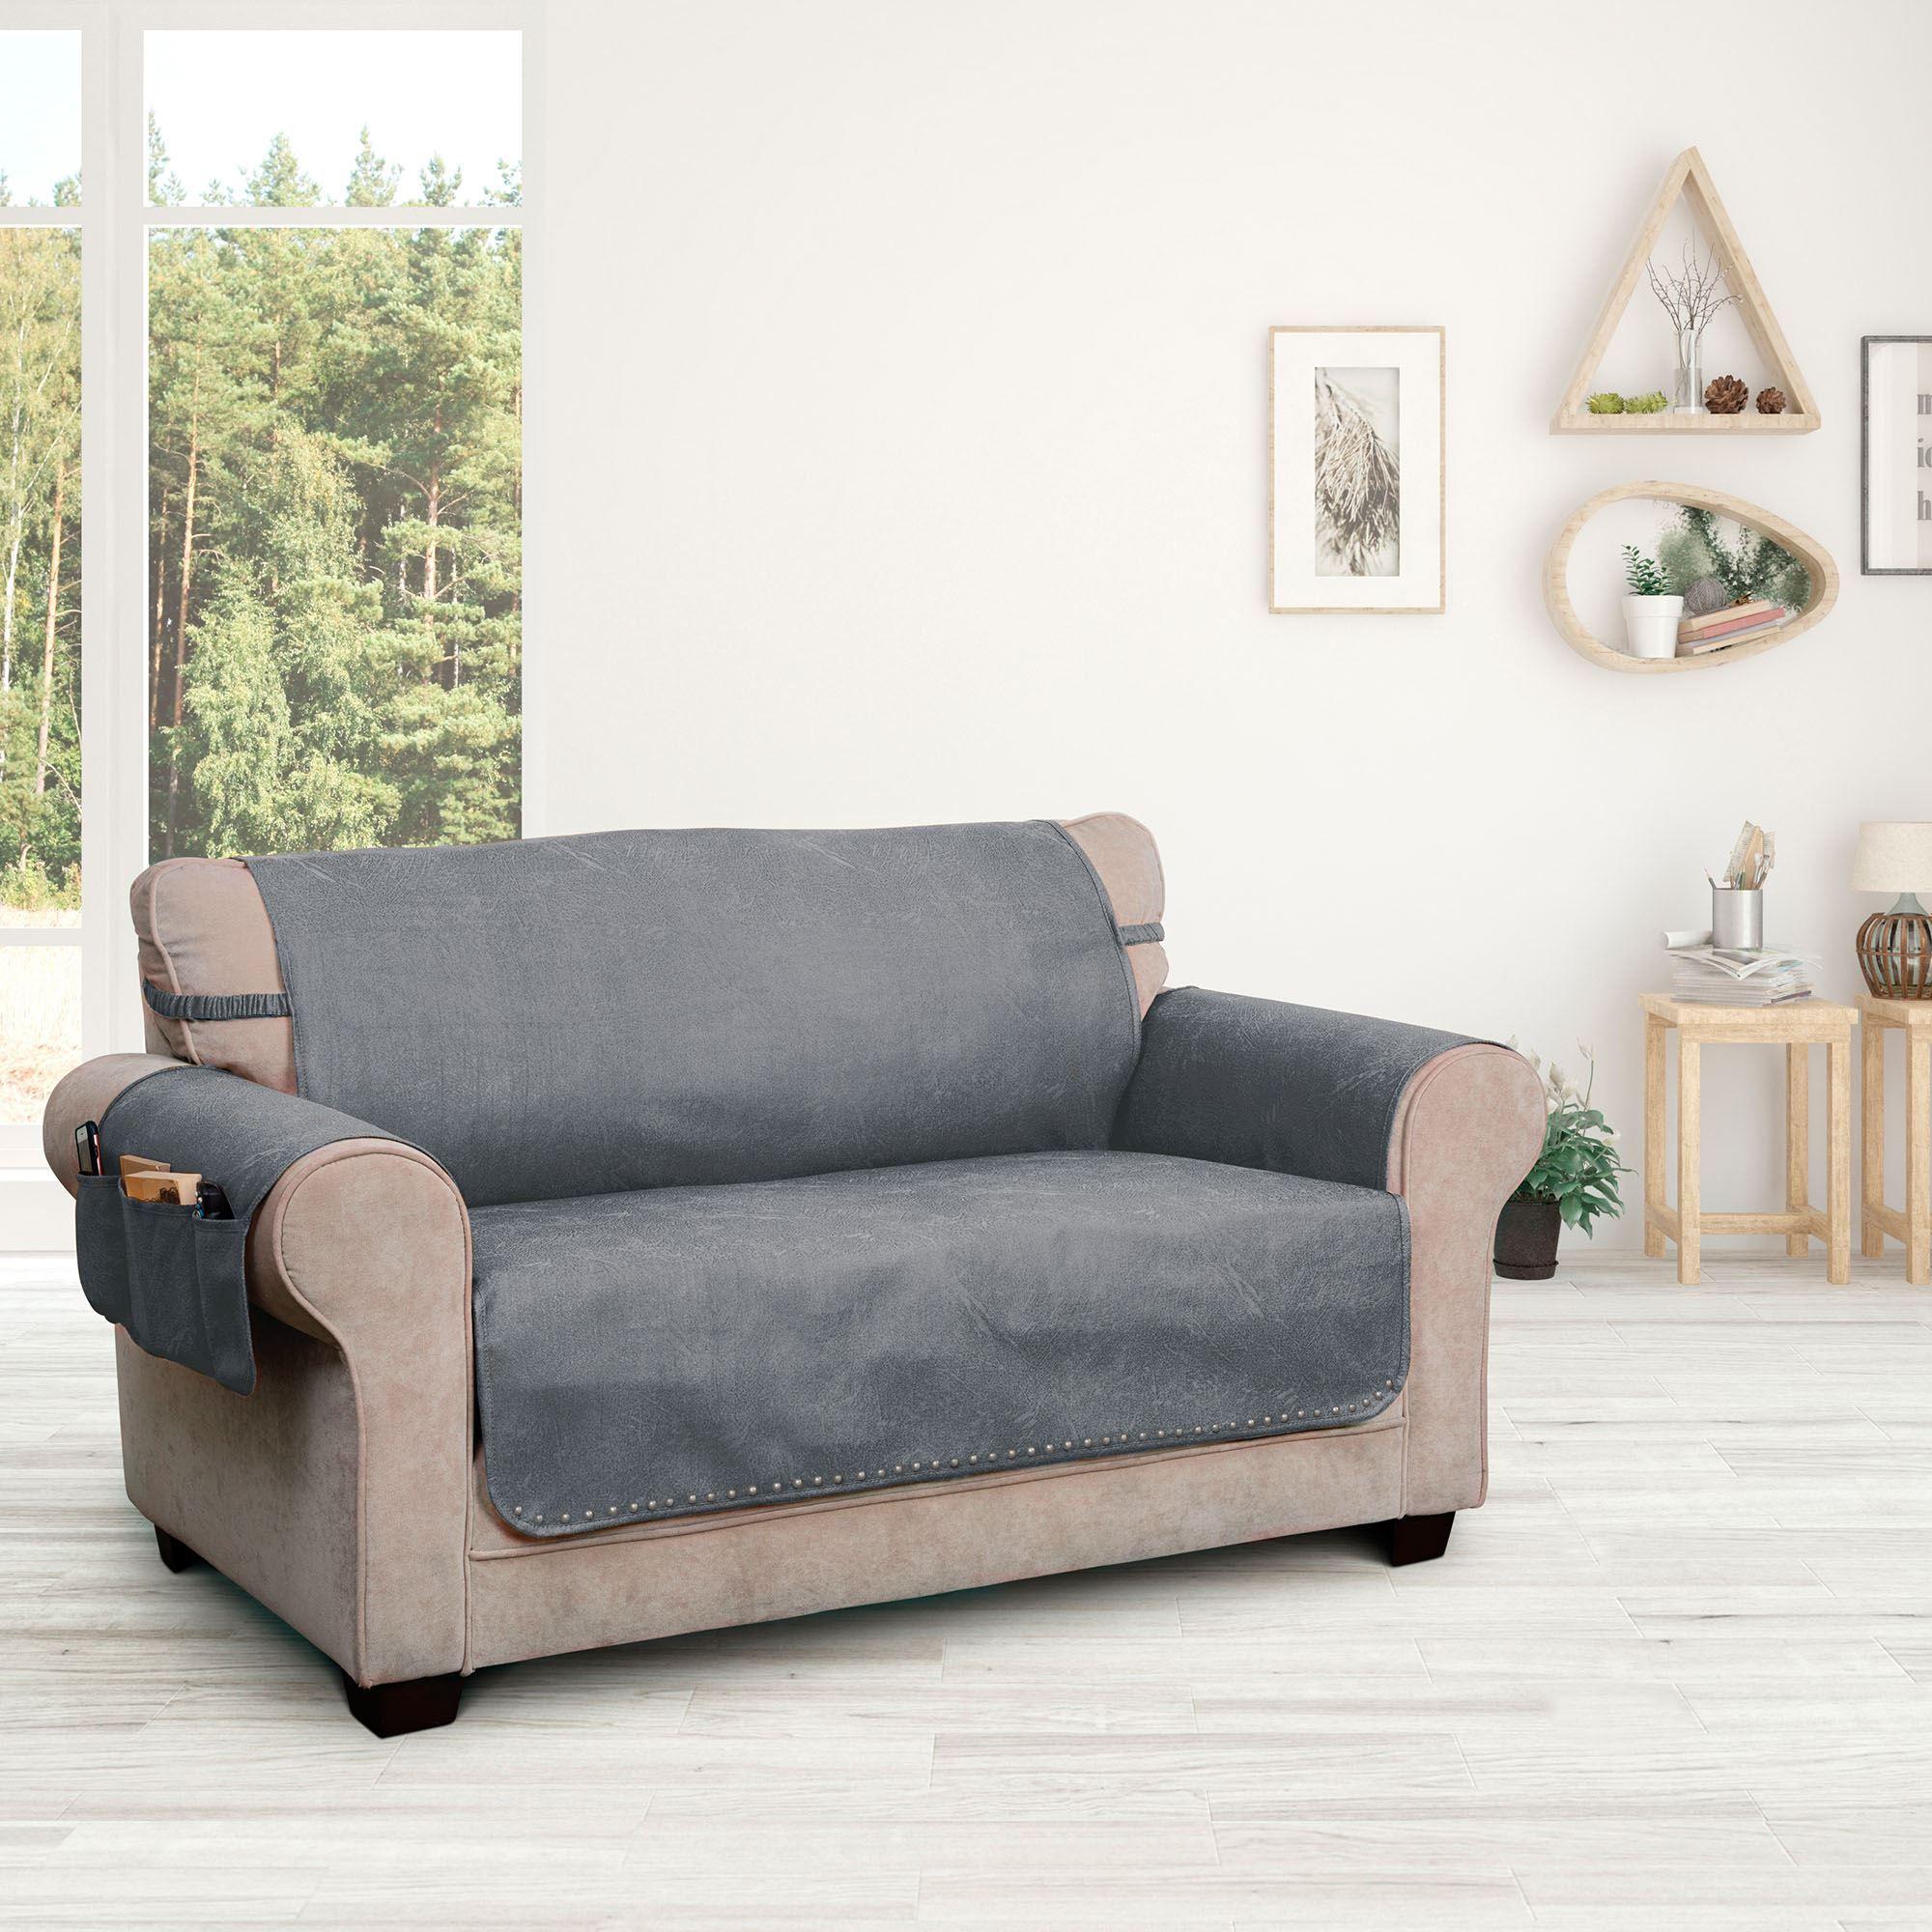 Stonehill Dark Gray Faux Leather Slip Resistant Furniture